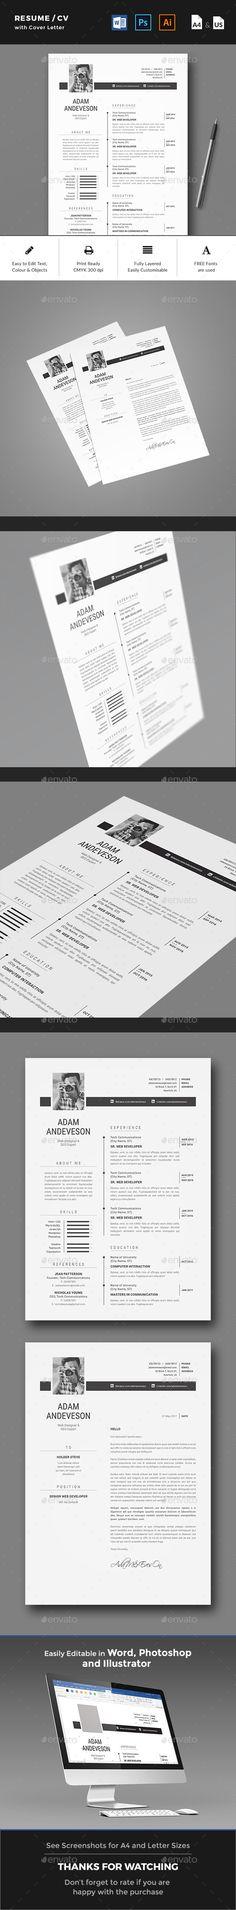 Resume Word Bundle Resume cv - resume layout template